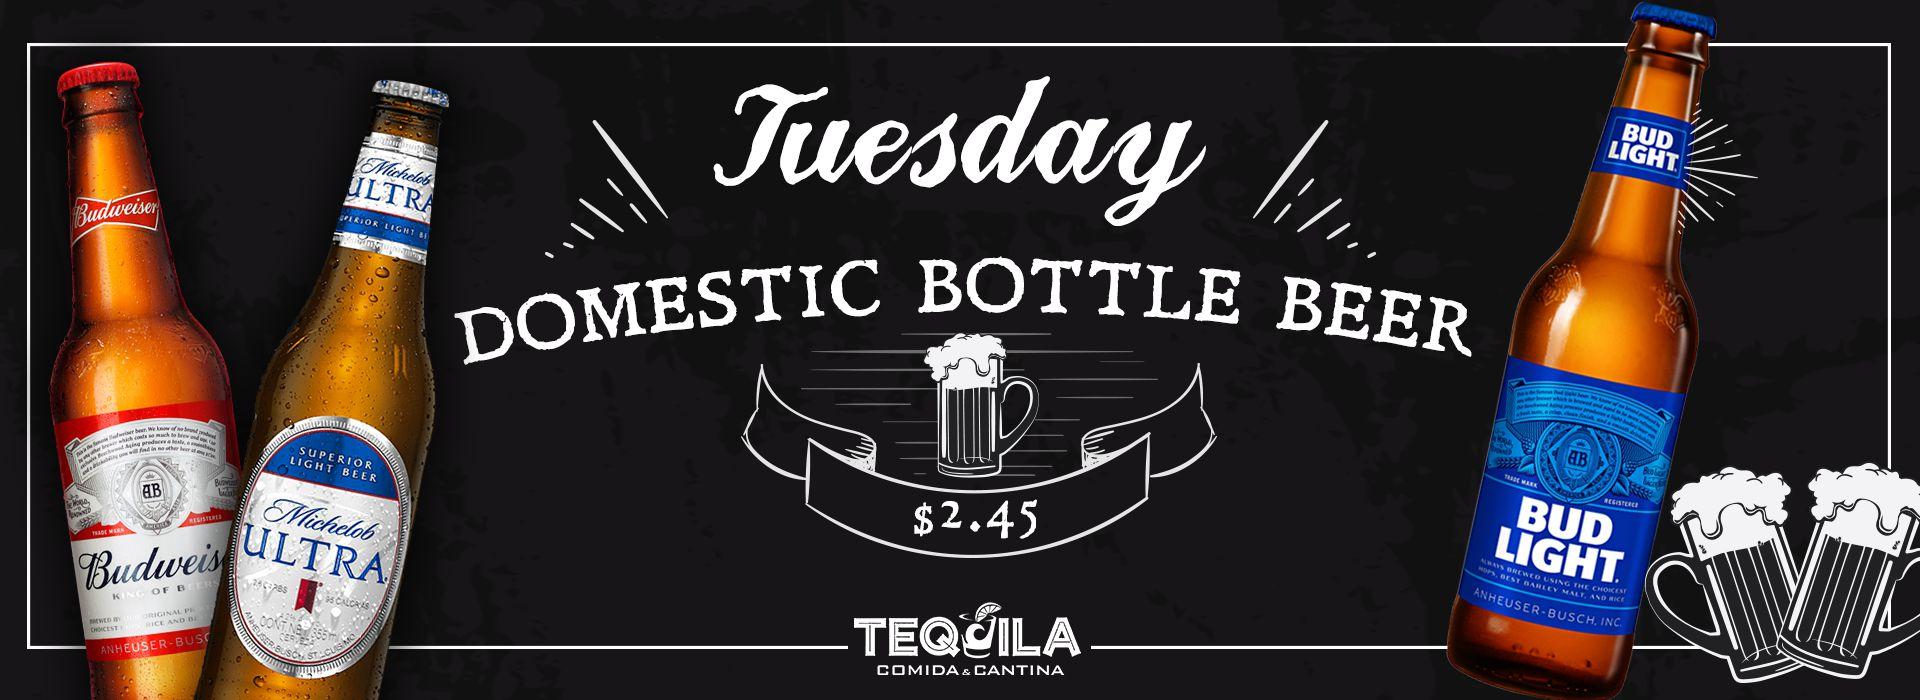 TEQUILA DRINKS BANNER 1920X700 NOV 03